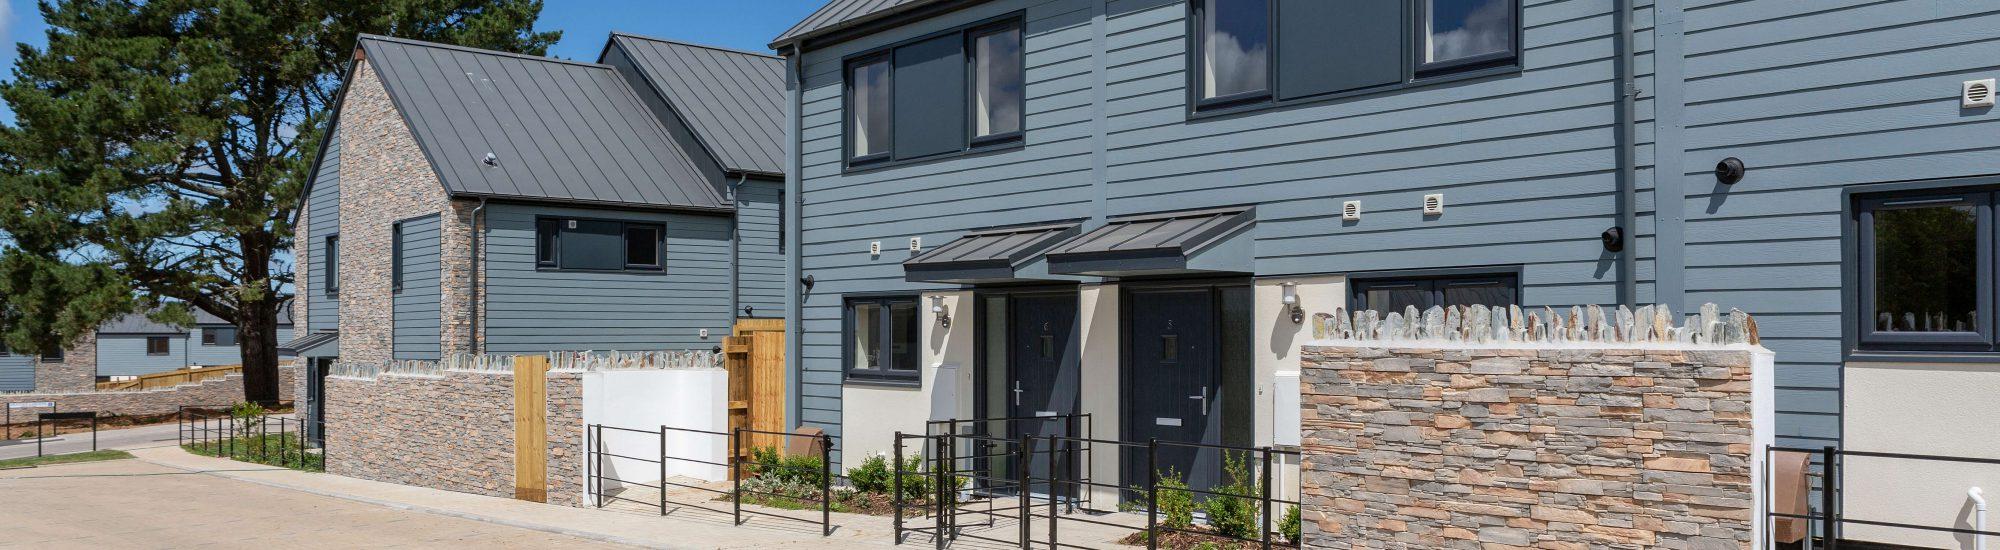 Bodmin Housing 019 2000x550 - Meet The Team